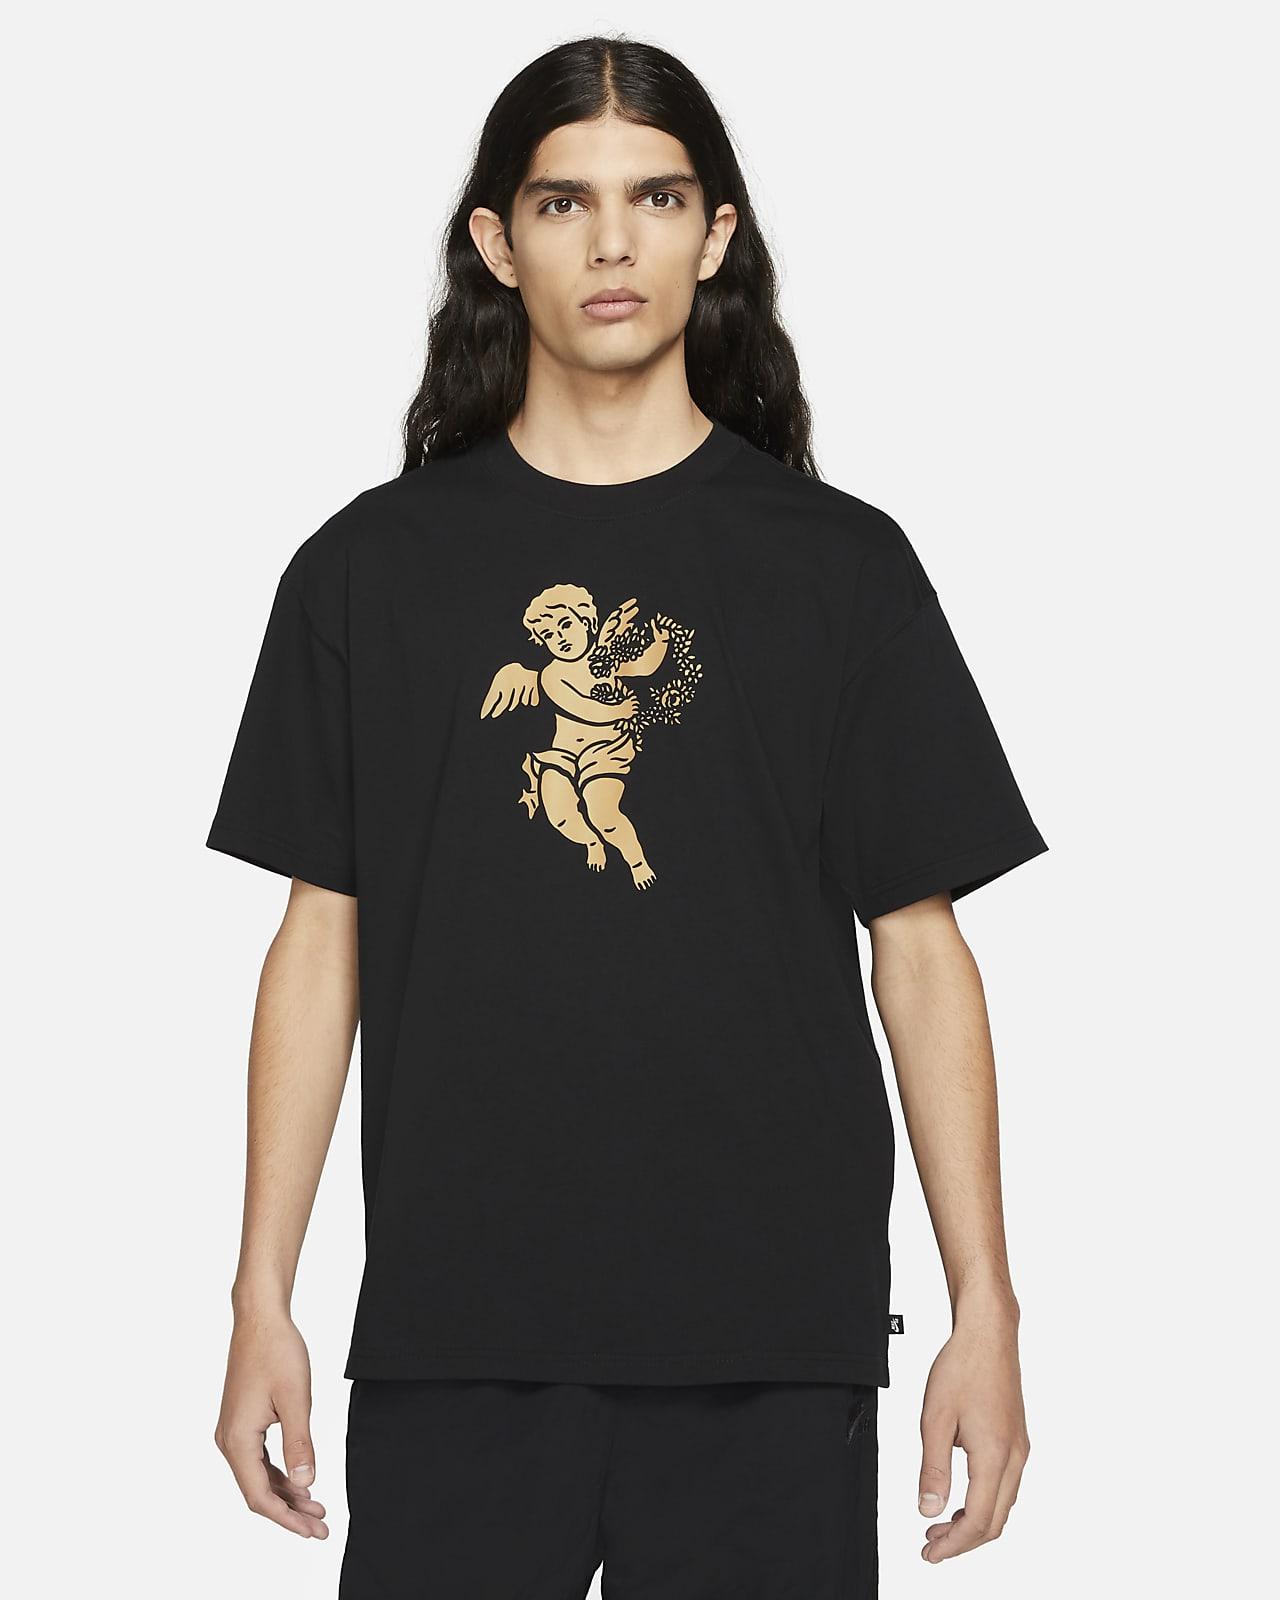 Tee-shirt de skateboard à motif Nike SB pour Homme